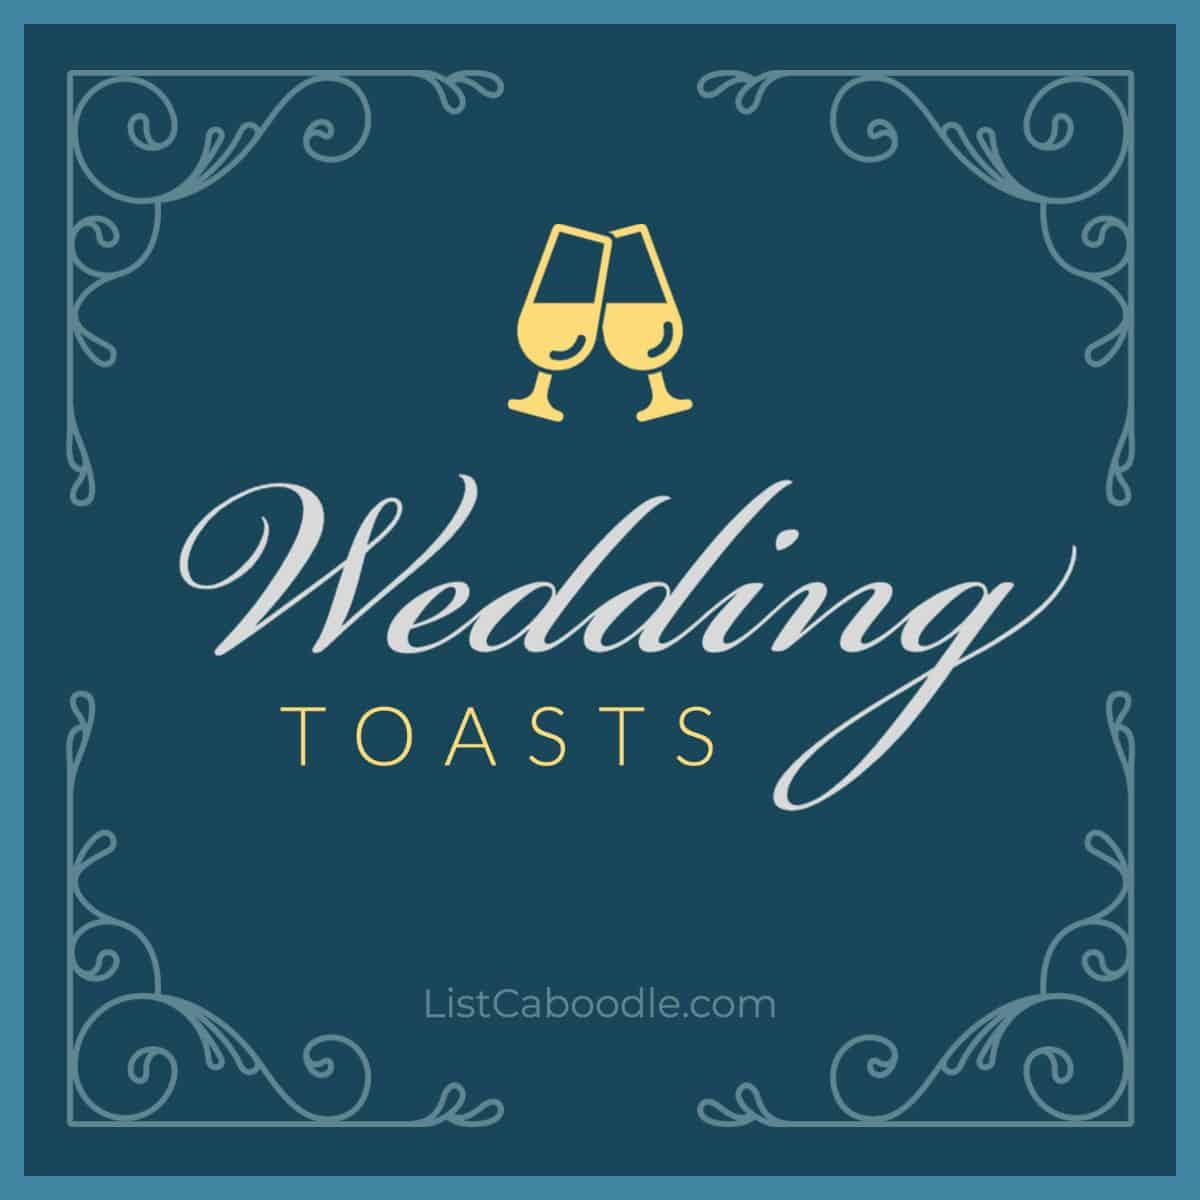 Wedding Toasts image